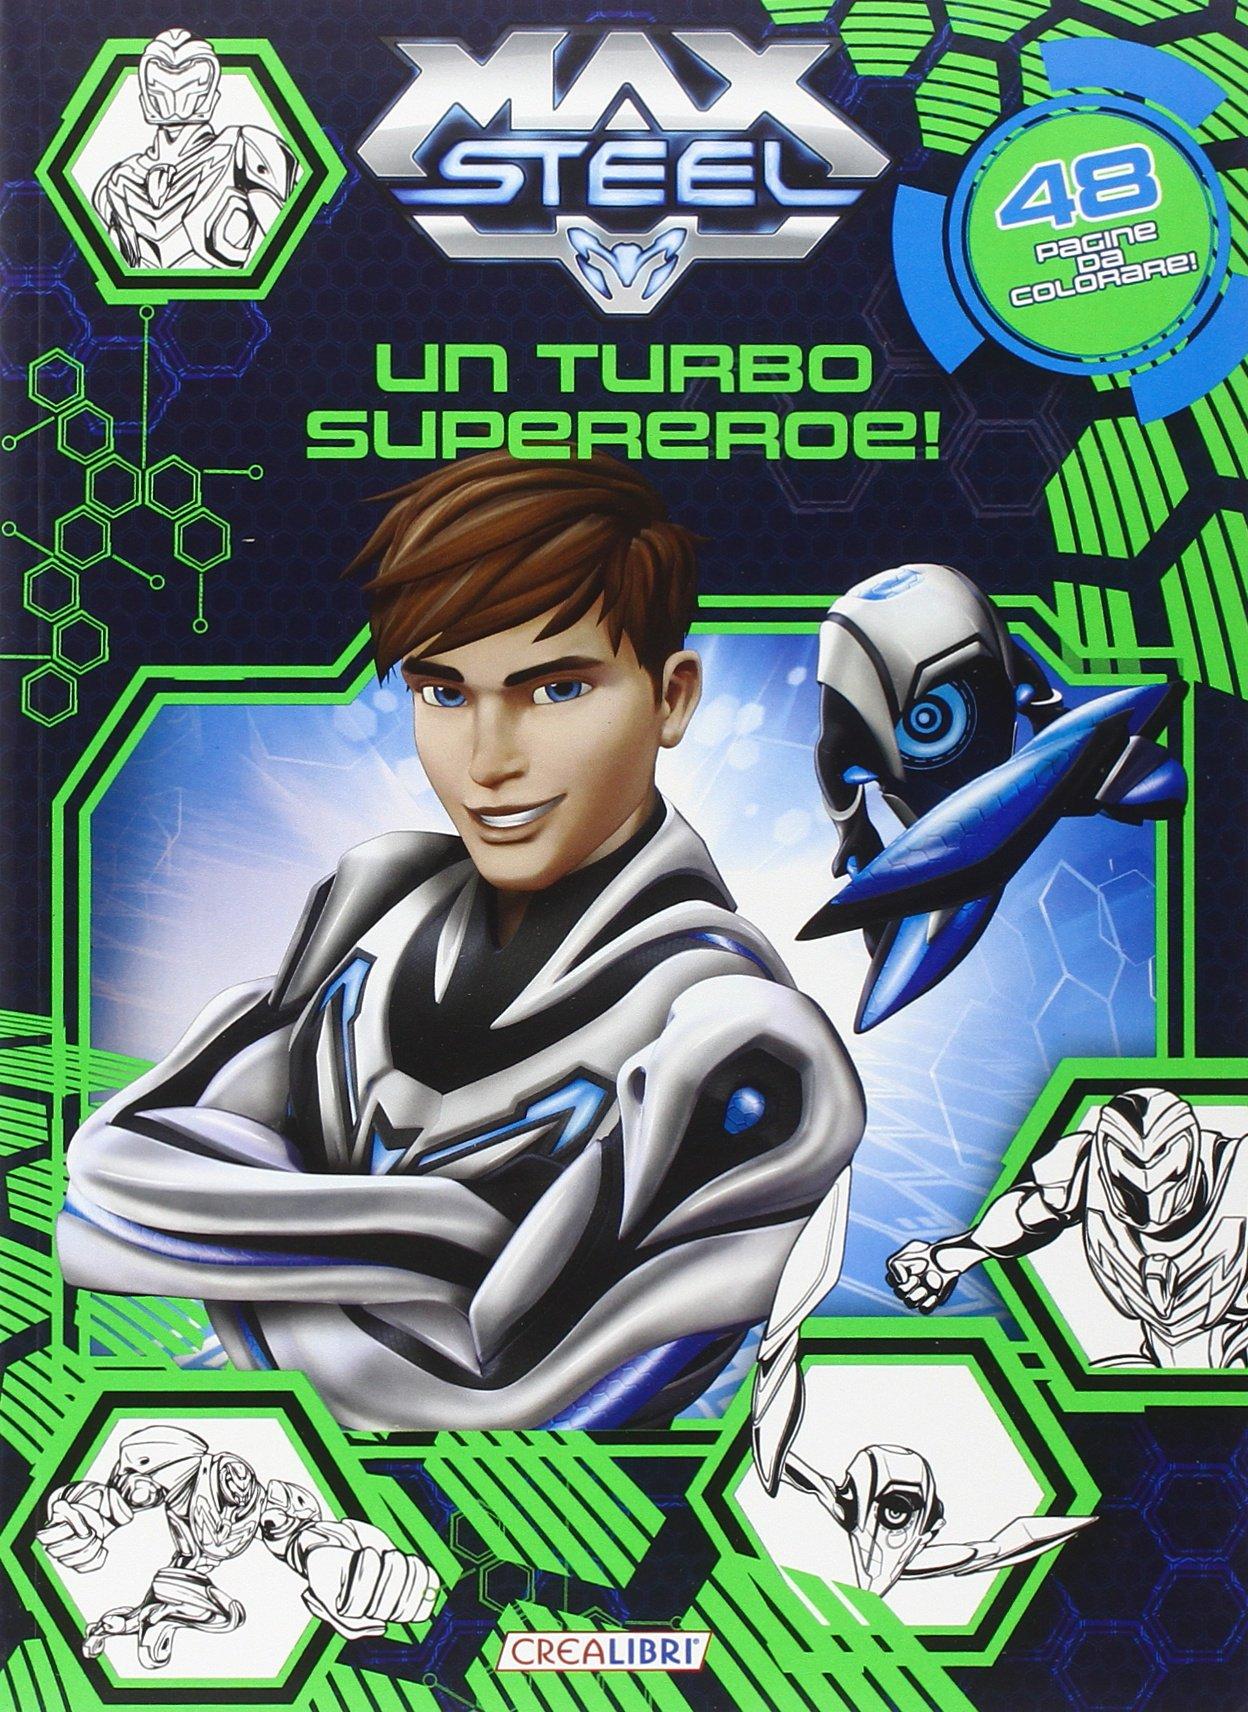 Un turbo supereroe! Max Steel. Ediz. illustrata: Amazon.es: Libros en idiomas extranjeros